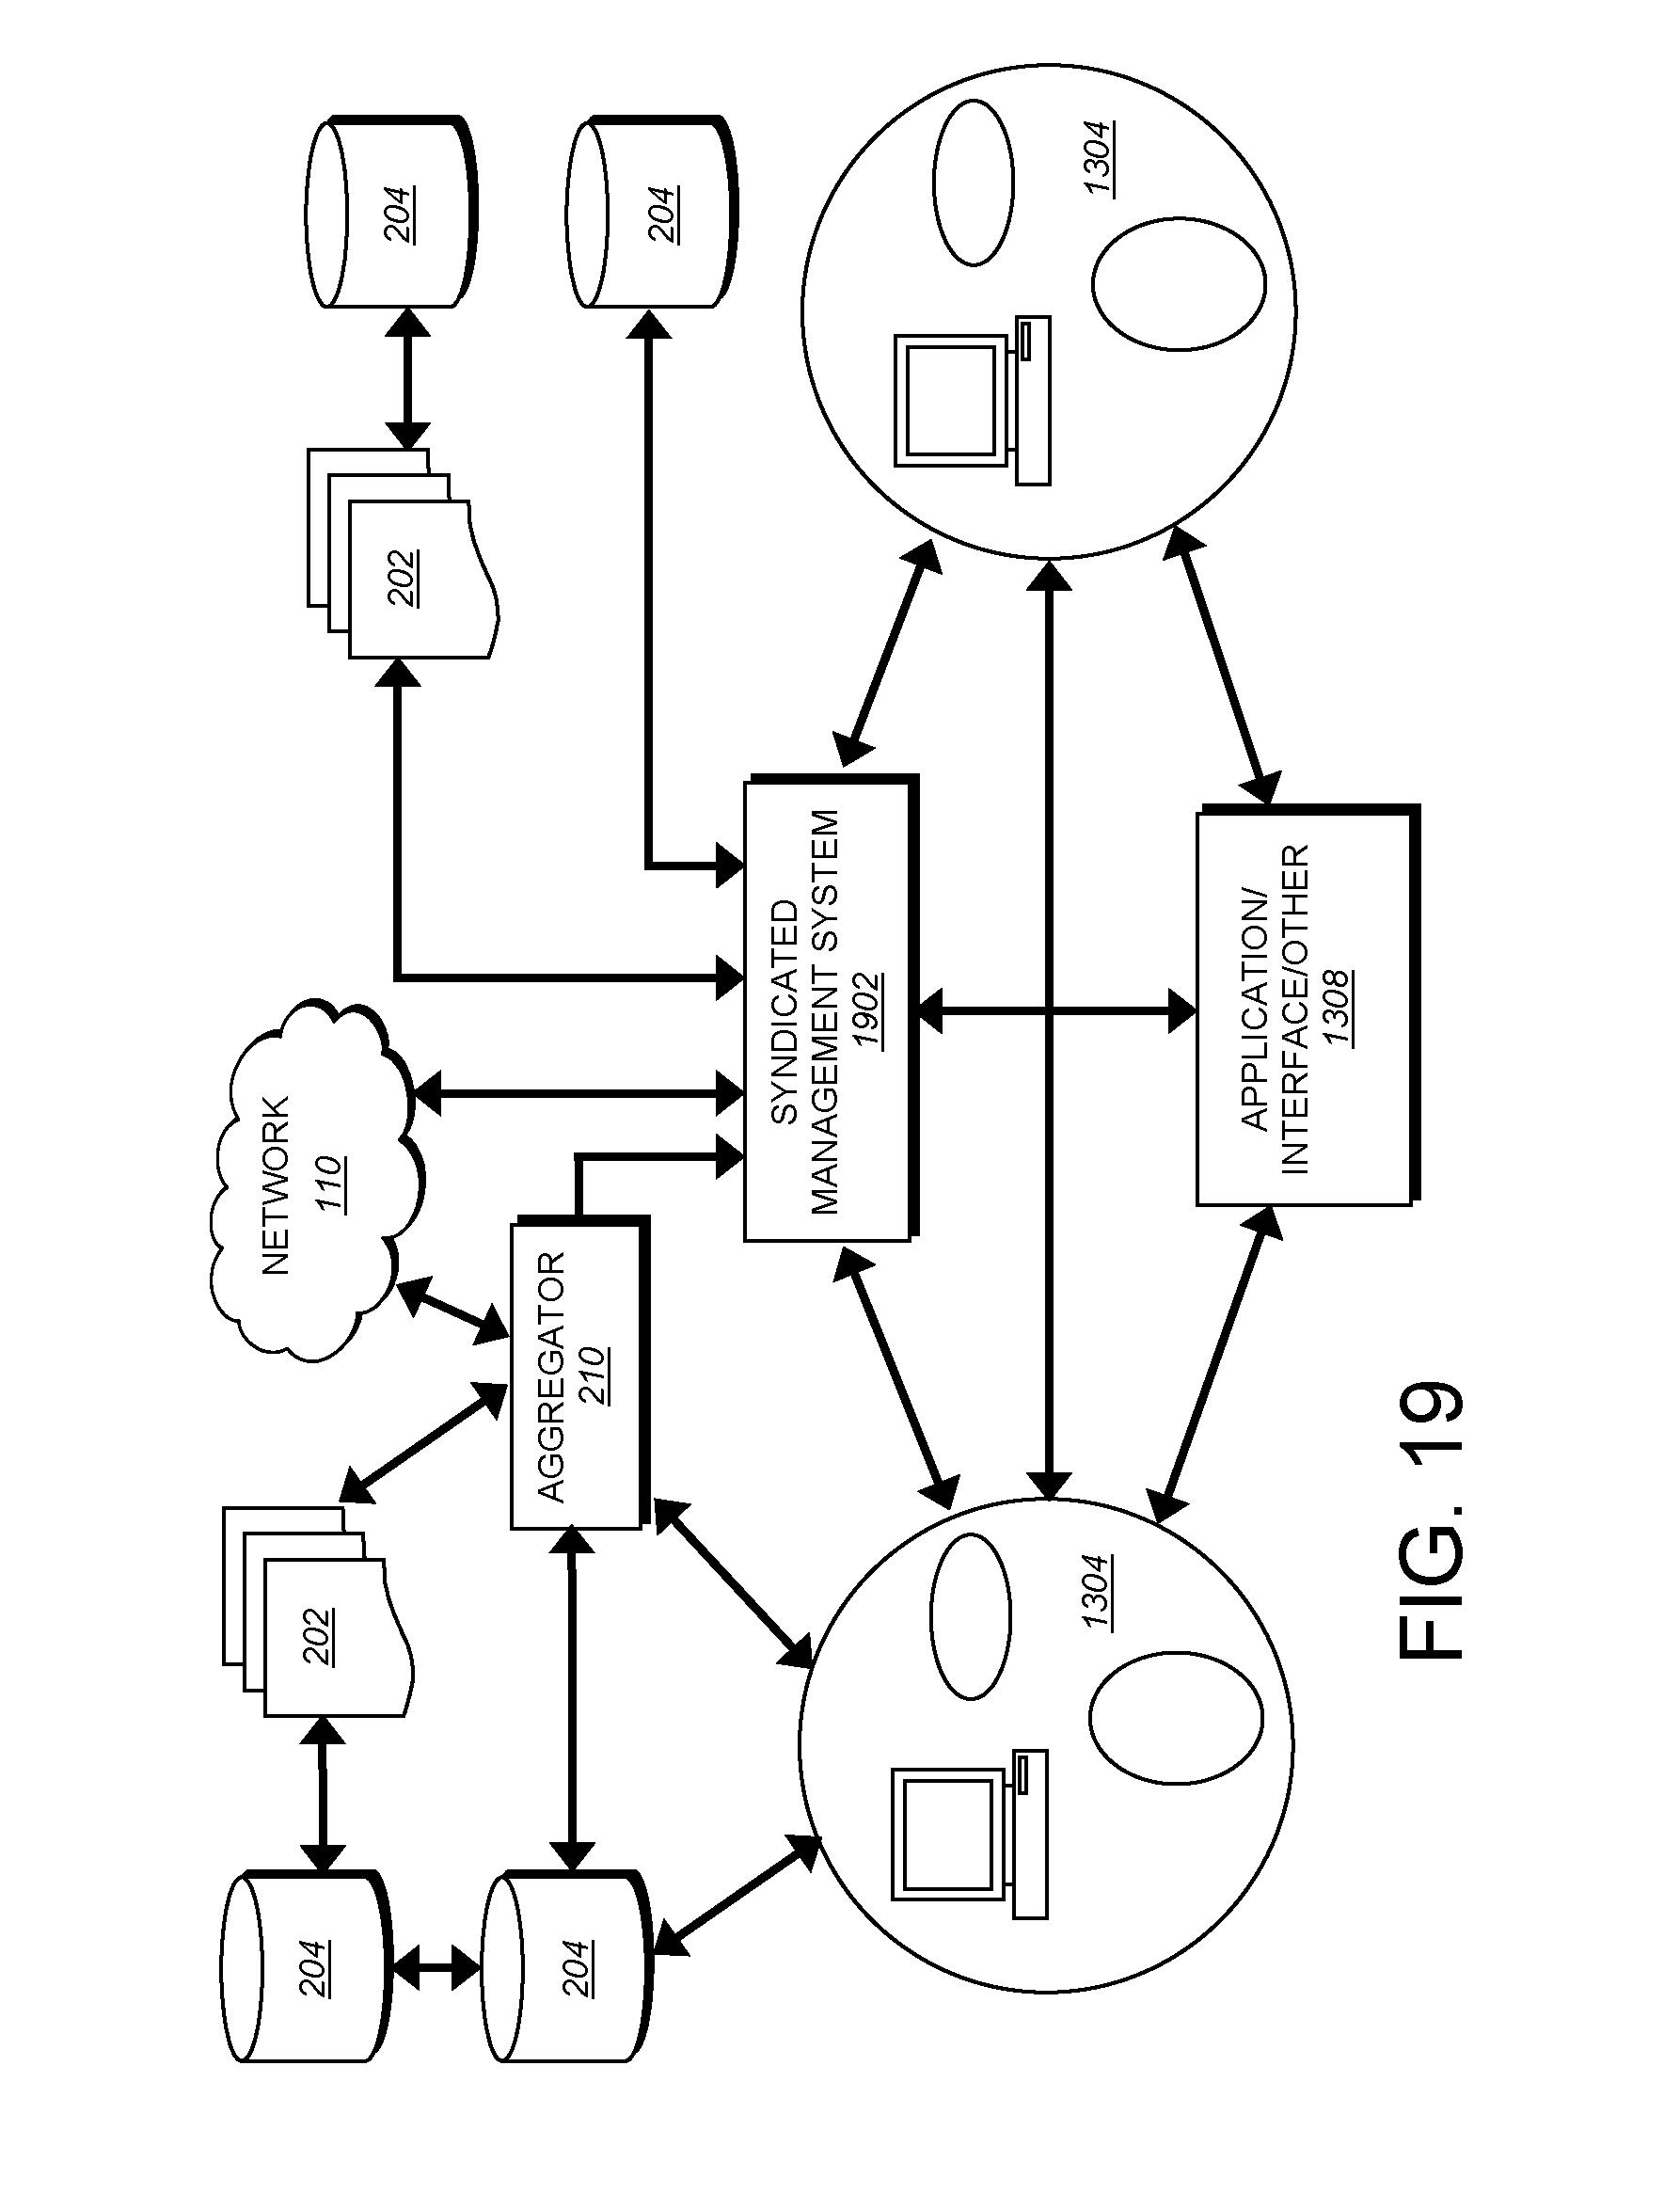 Patent US 9,202,084 B2